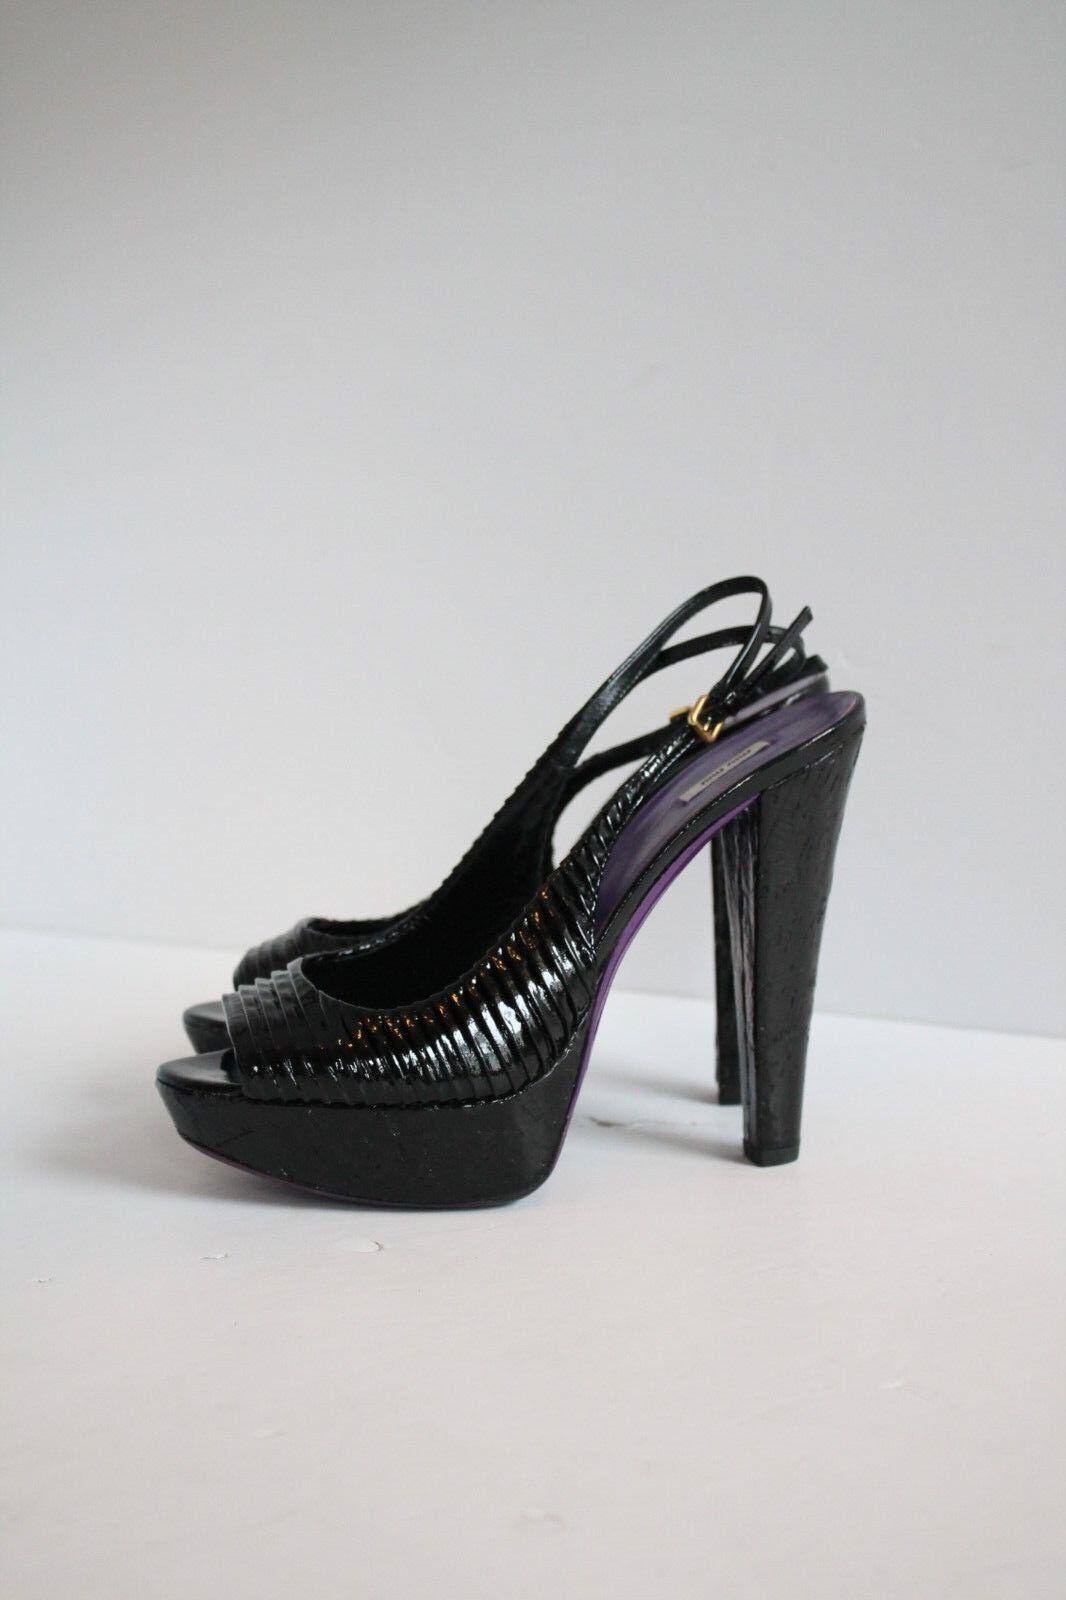 Miu Miu Slingback Cork Platform Patent Leather Heels, Size 5 1 2 UK 38 1 2 EU